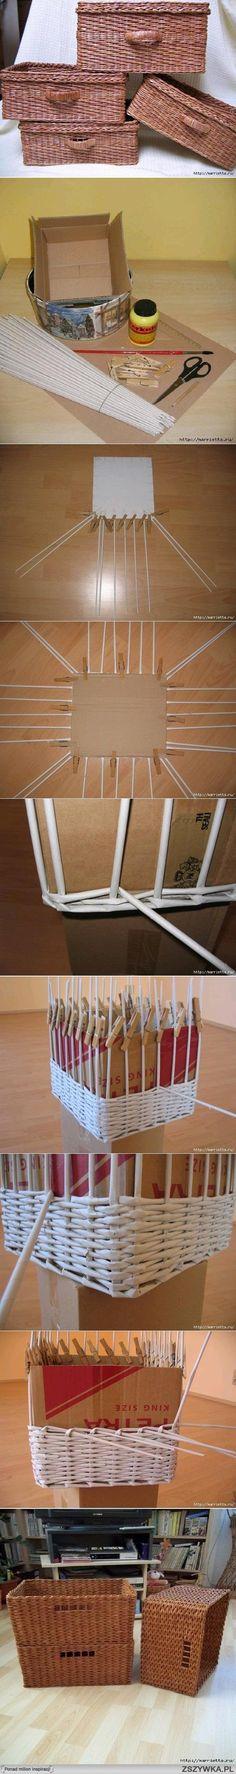 diy, diy projects, diy craft, handmade, diy ideas, diy newspaper weave basket